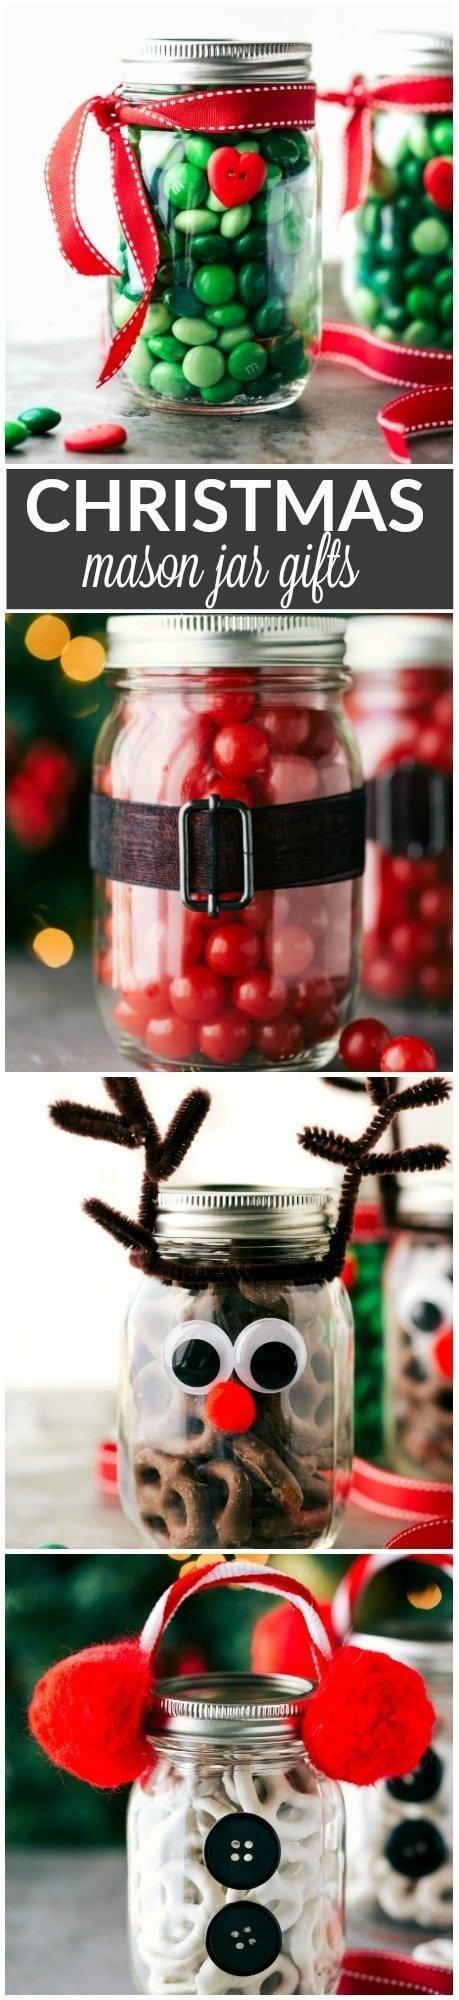 10 Cute Mason Jar Christmas Gift Ideas christmas mason jar gift ideas chelseas messy apron